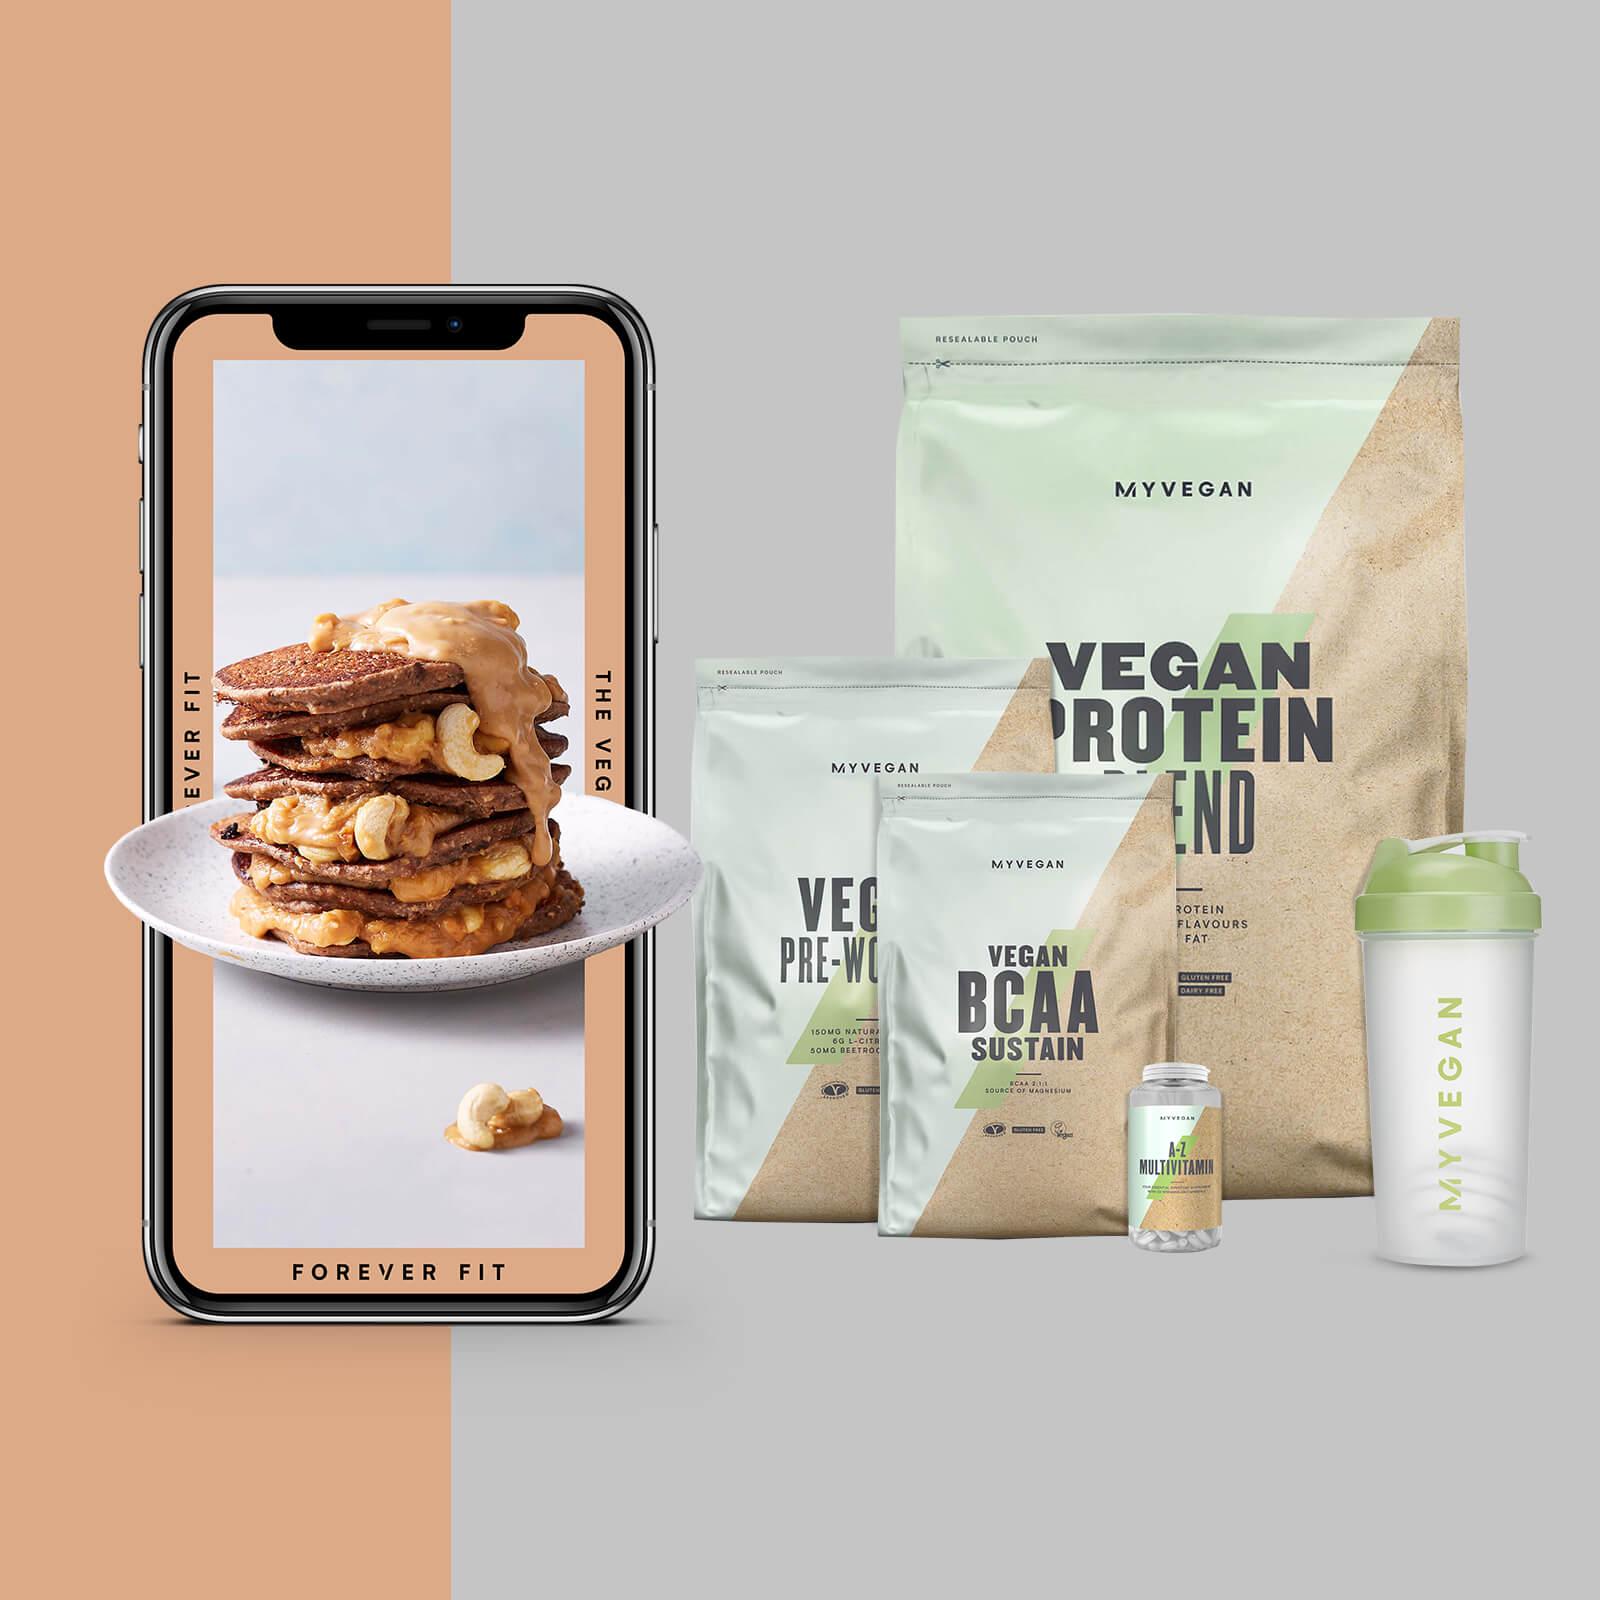 Le Pack Vegan + Guide Entraînement et Nutrition Offert - Lemon and Lime - Lemon Tea - Unflavoured